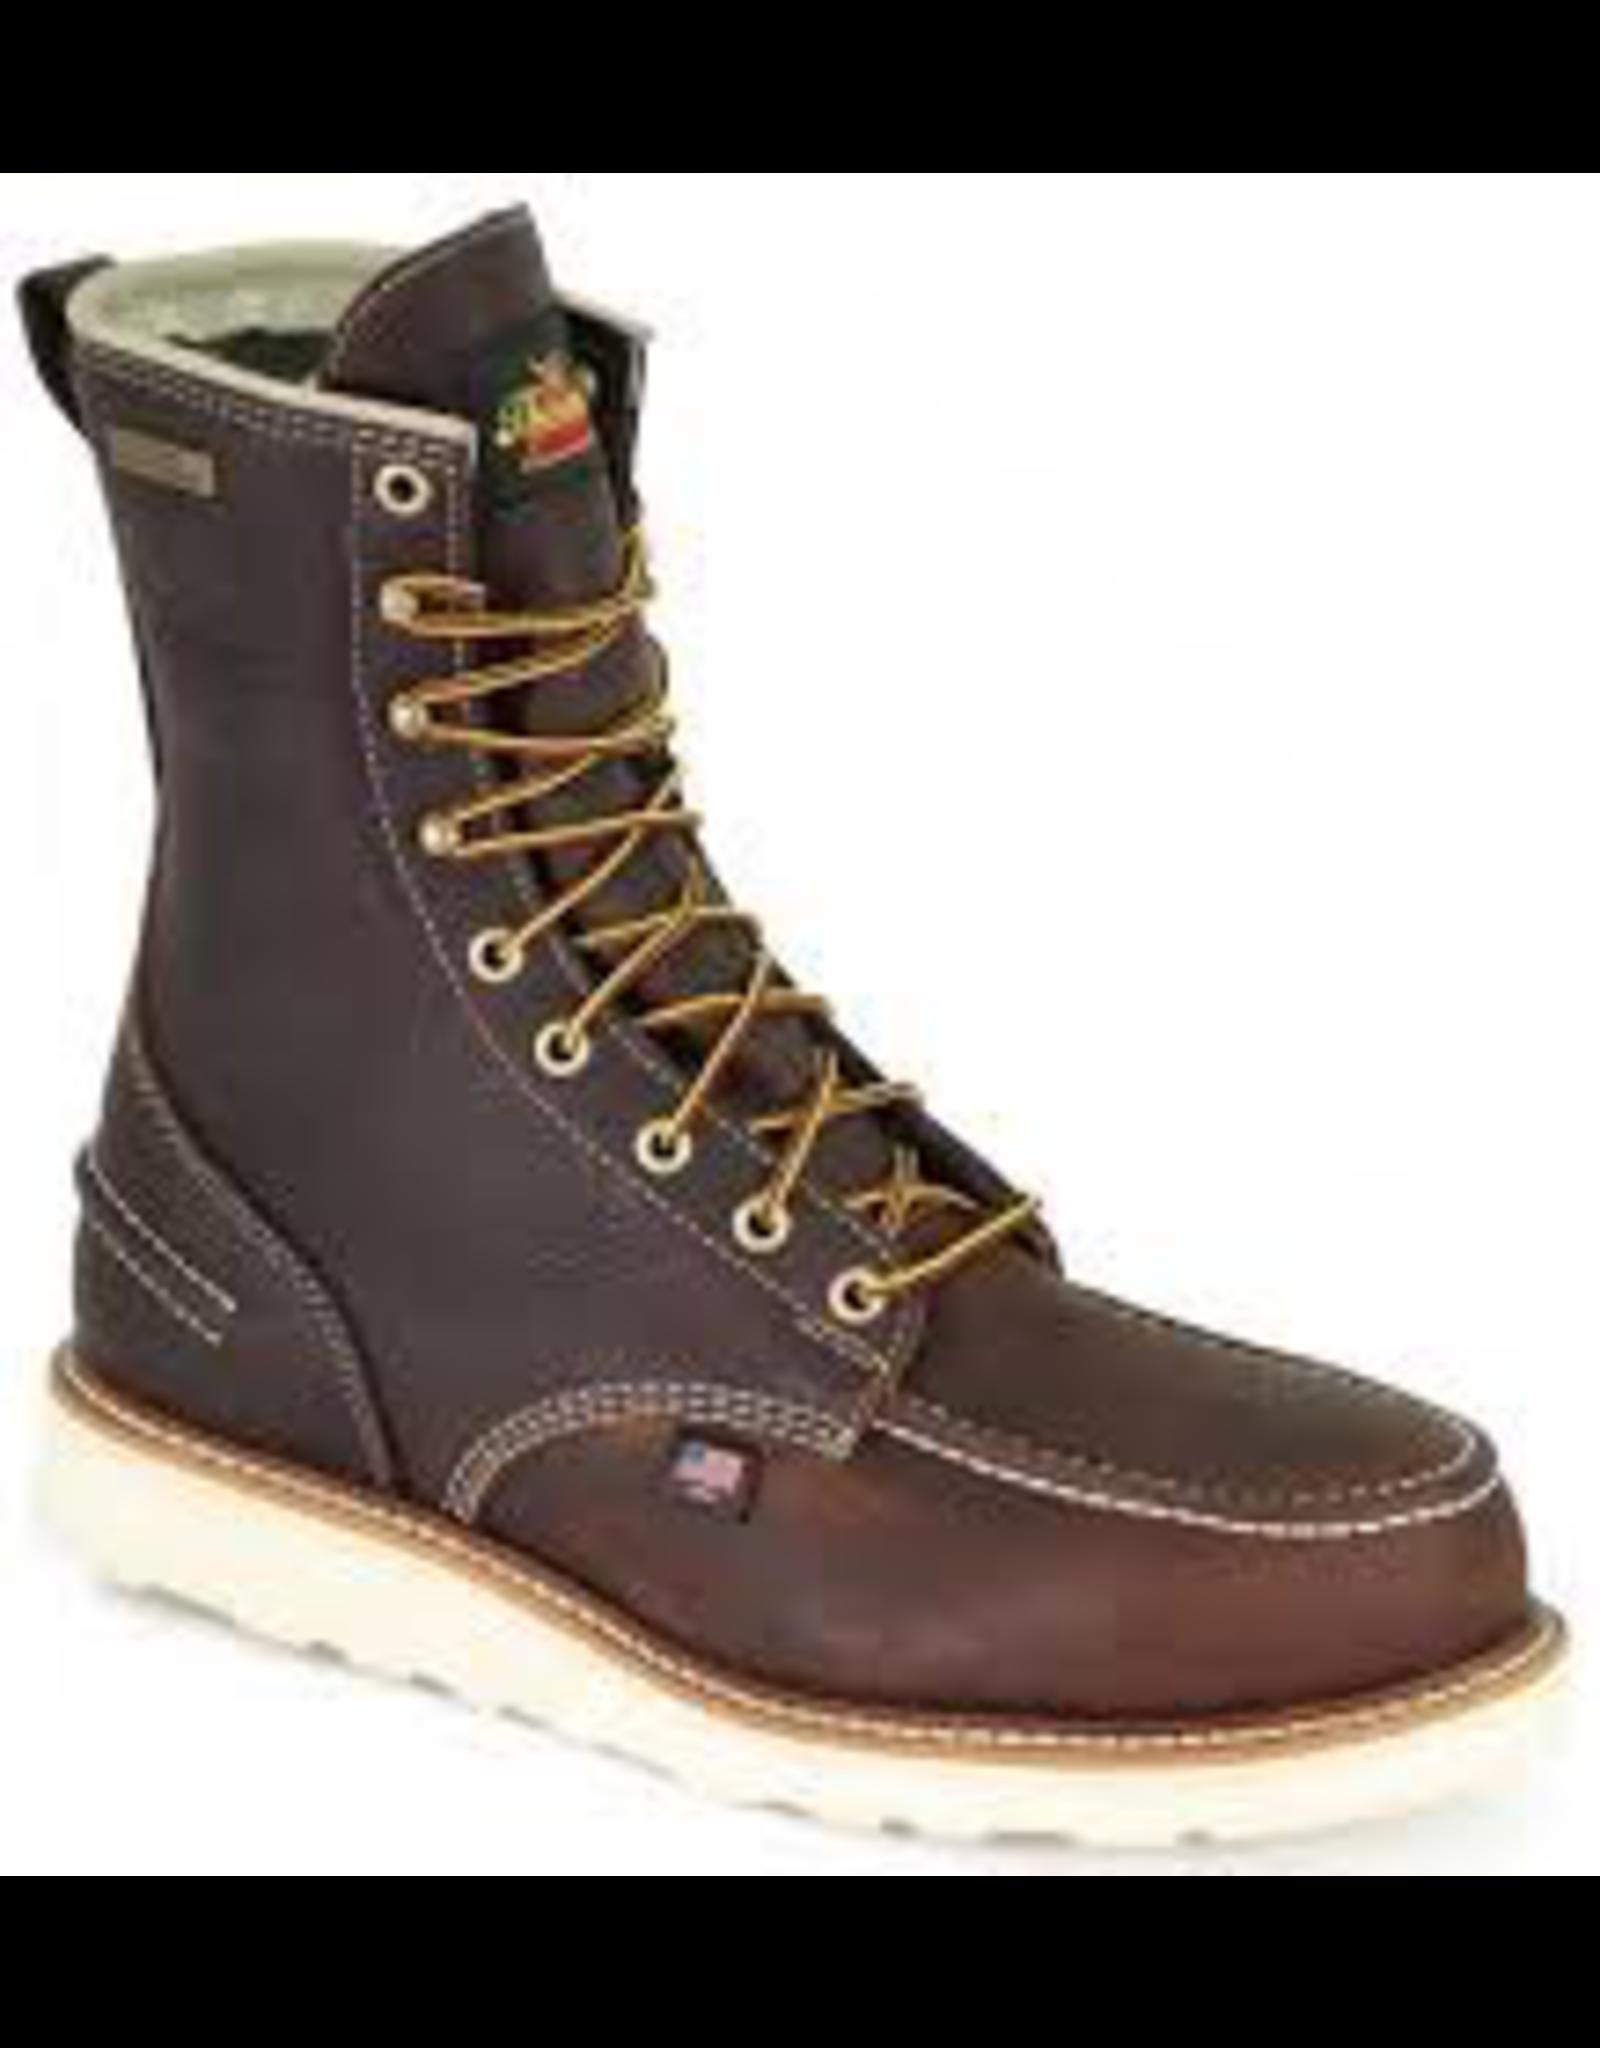 Boots-Men Thorogood 804-3800 8��� Safety Moc Toe